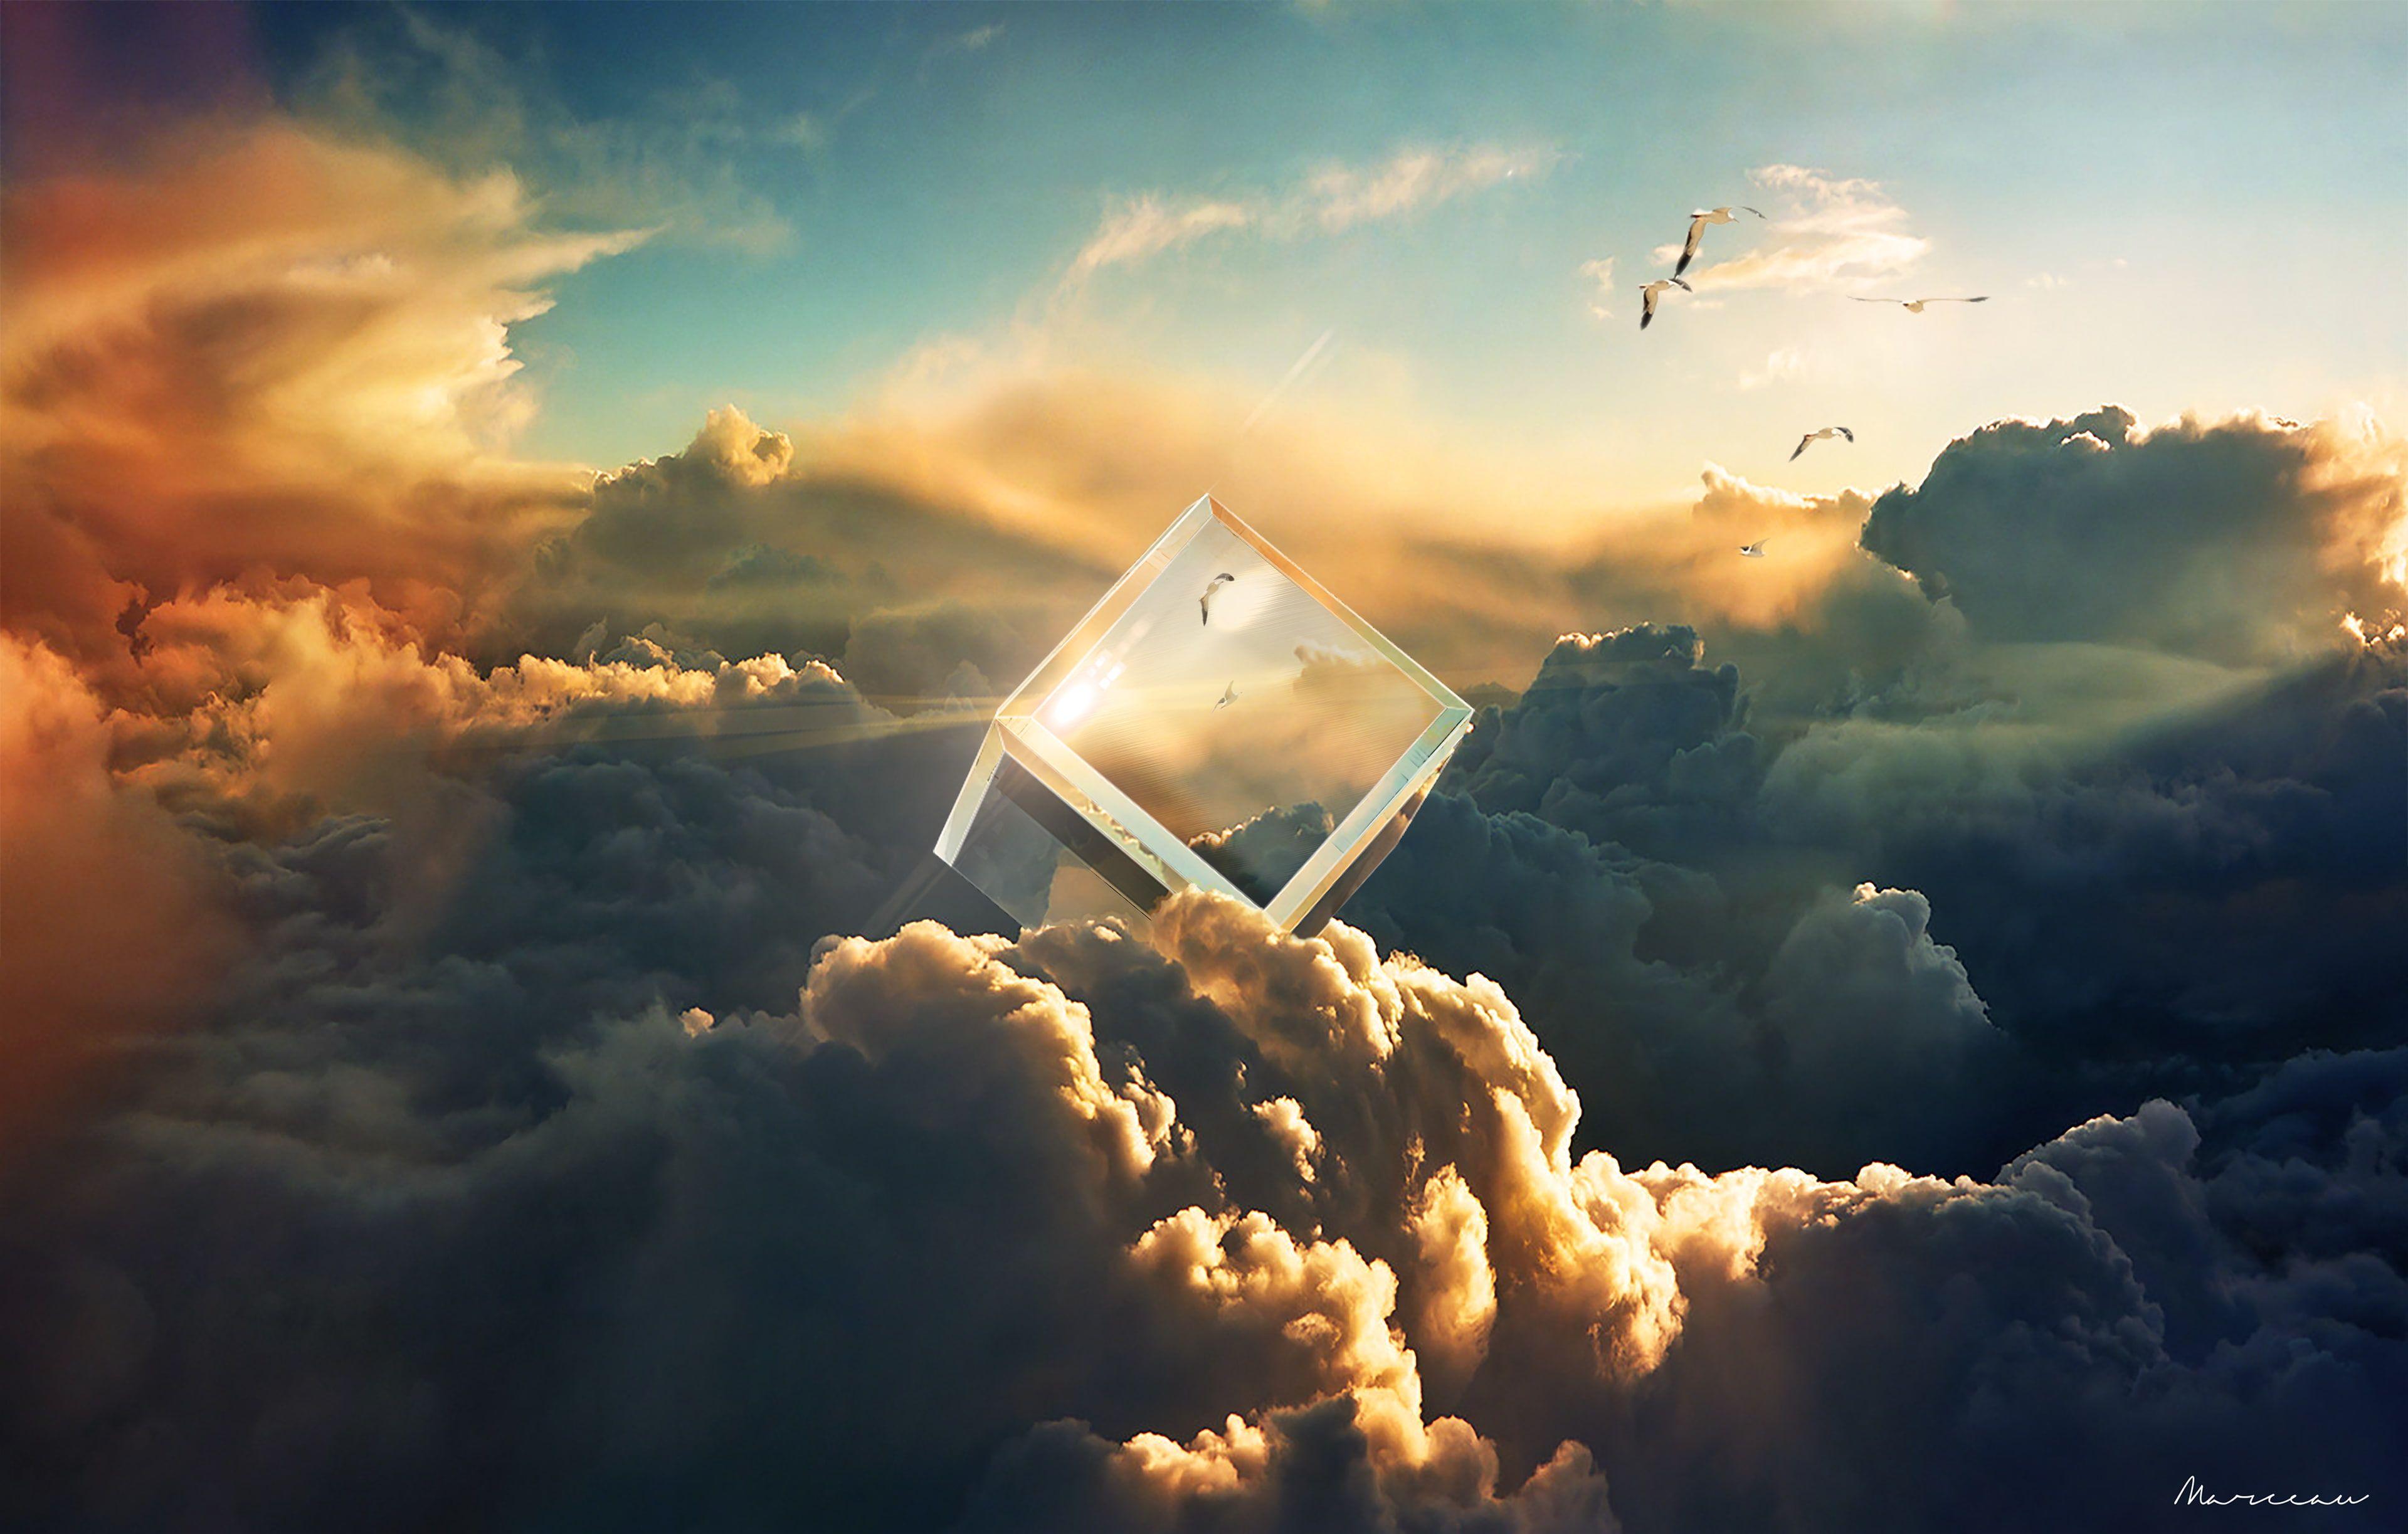 Birds 4k Crystal Cube Sky Clouds 4k Wallpaper Hdwallpaper Desktop Hipster Wallpaper Spring Desktop Wallpaper Desktop Wallpaper